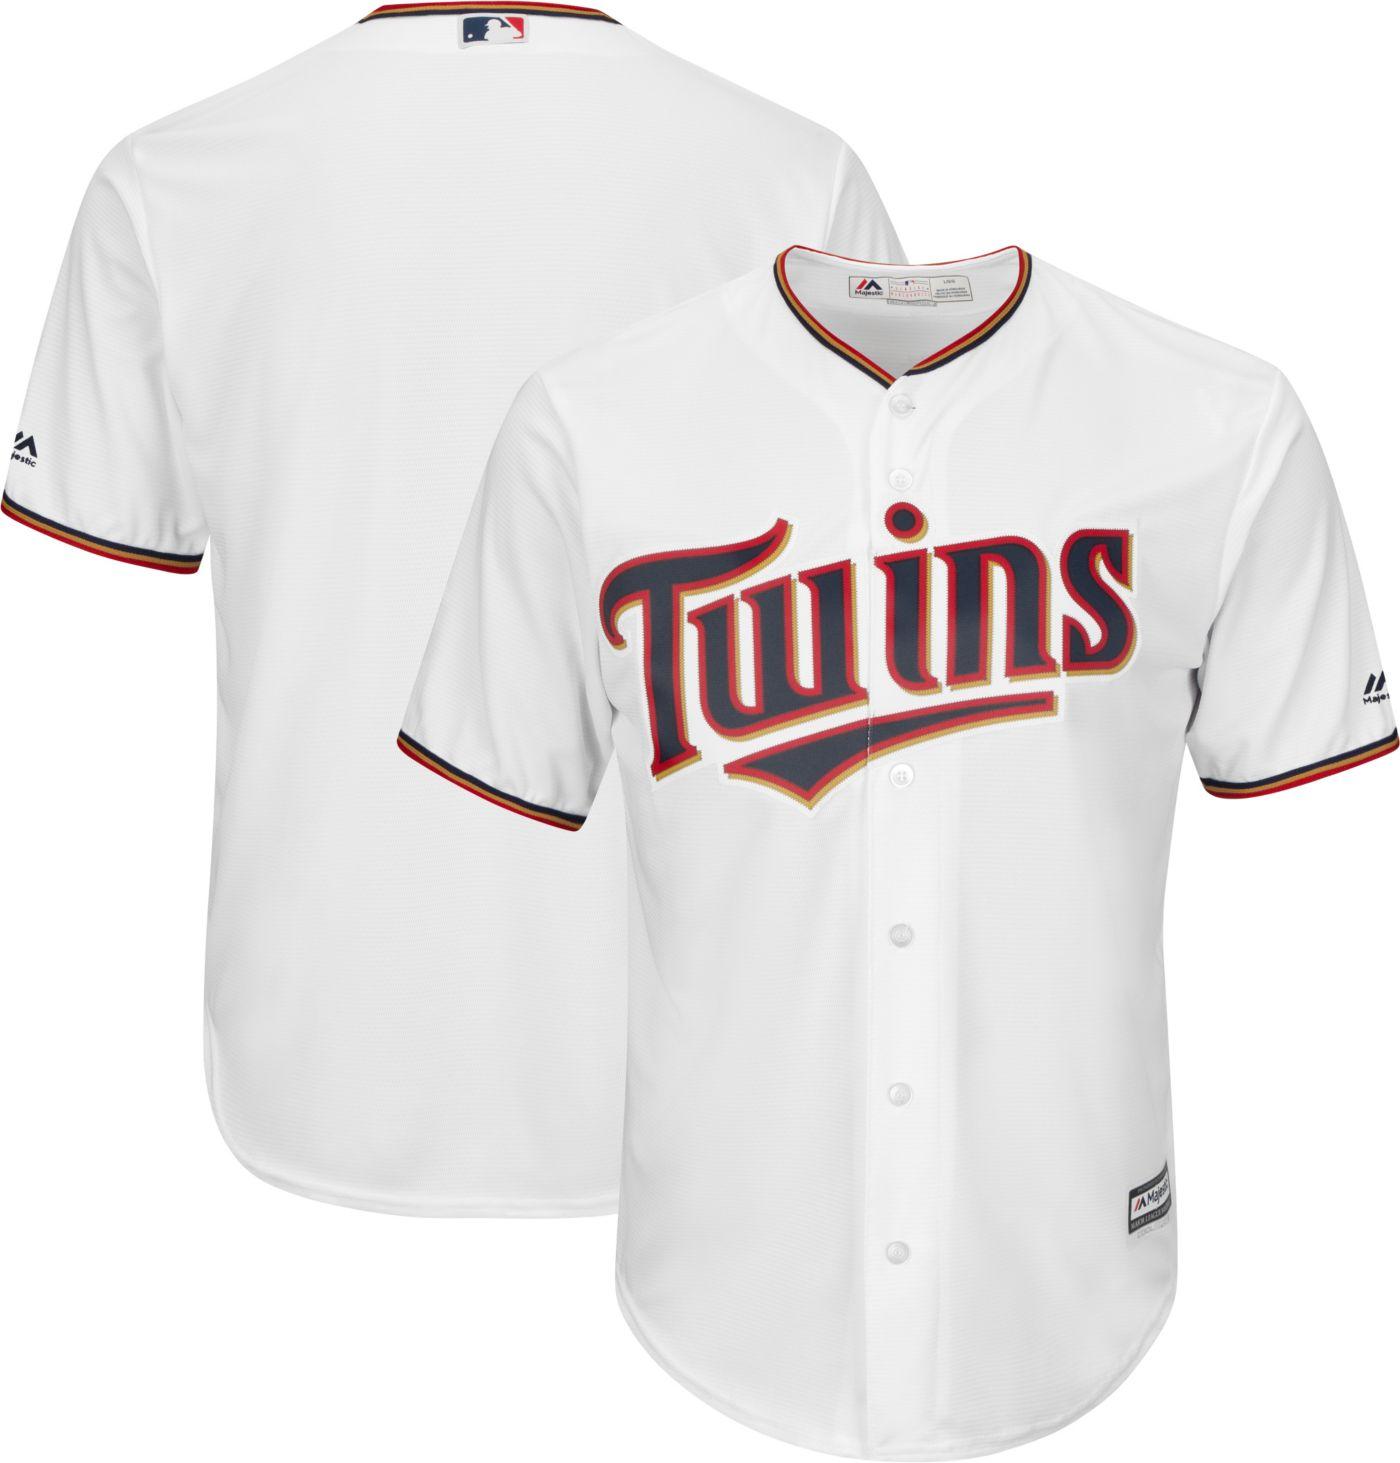 Majestic Men's Replica Minnesota Twins Cool Base Home White Jersey